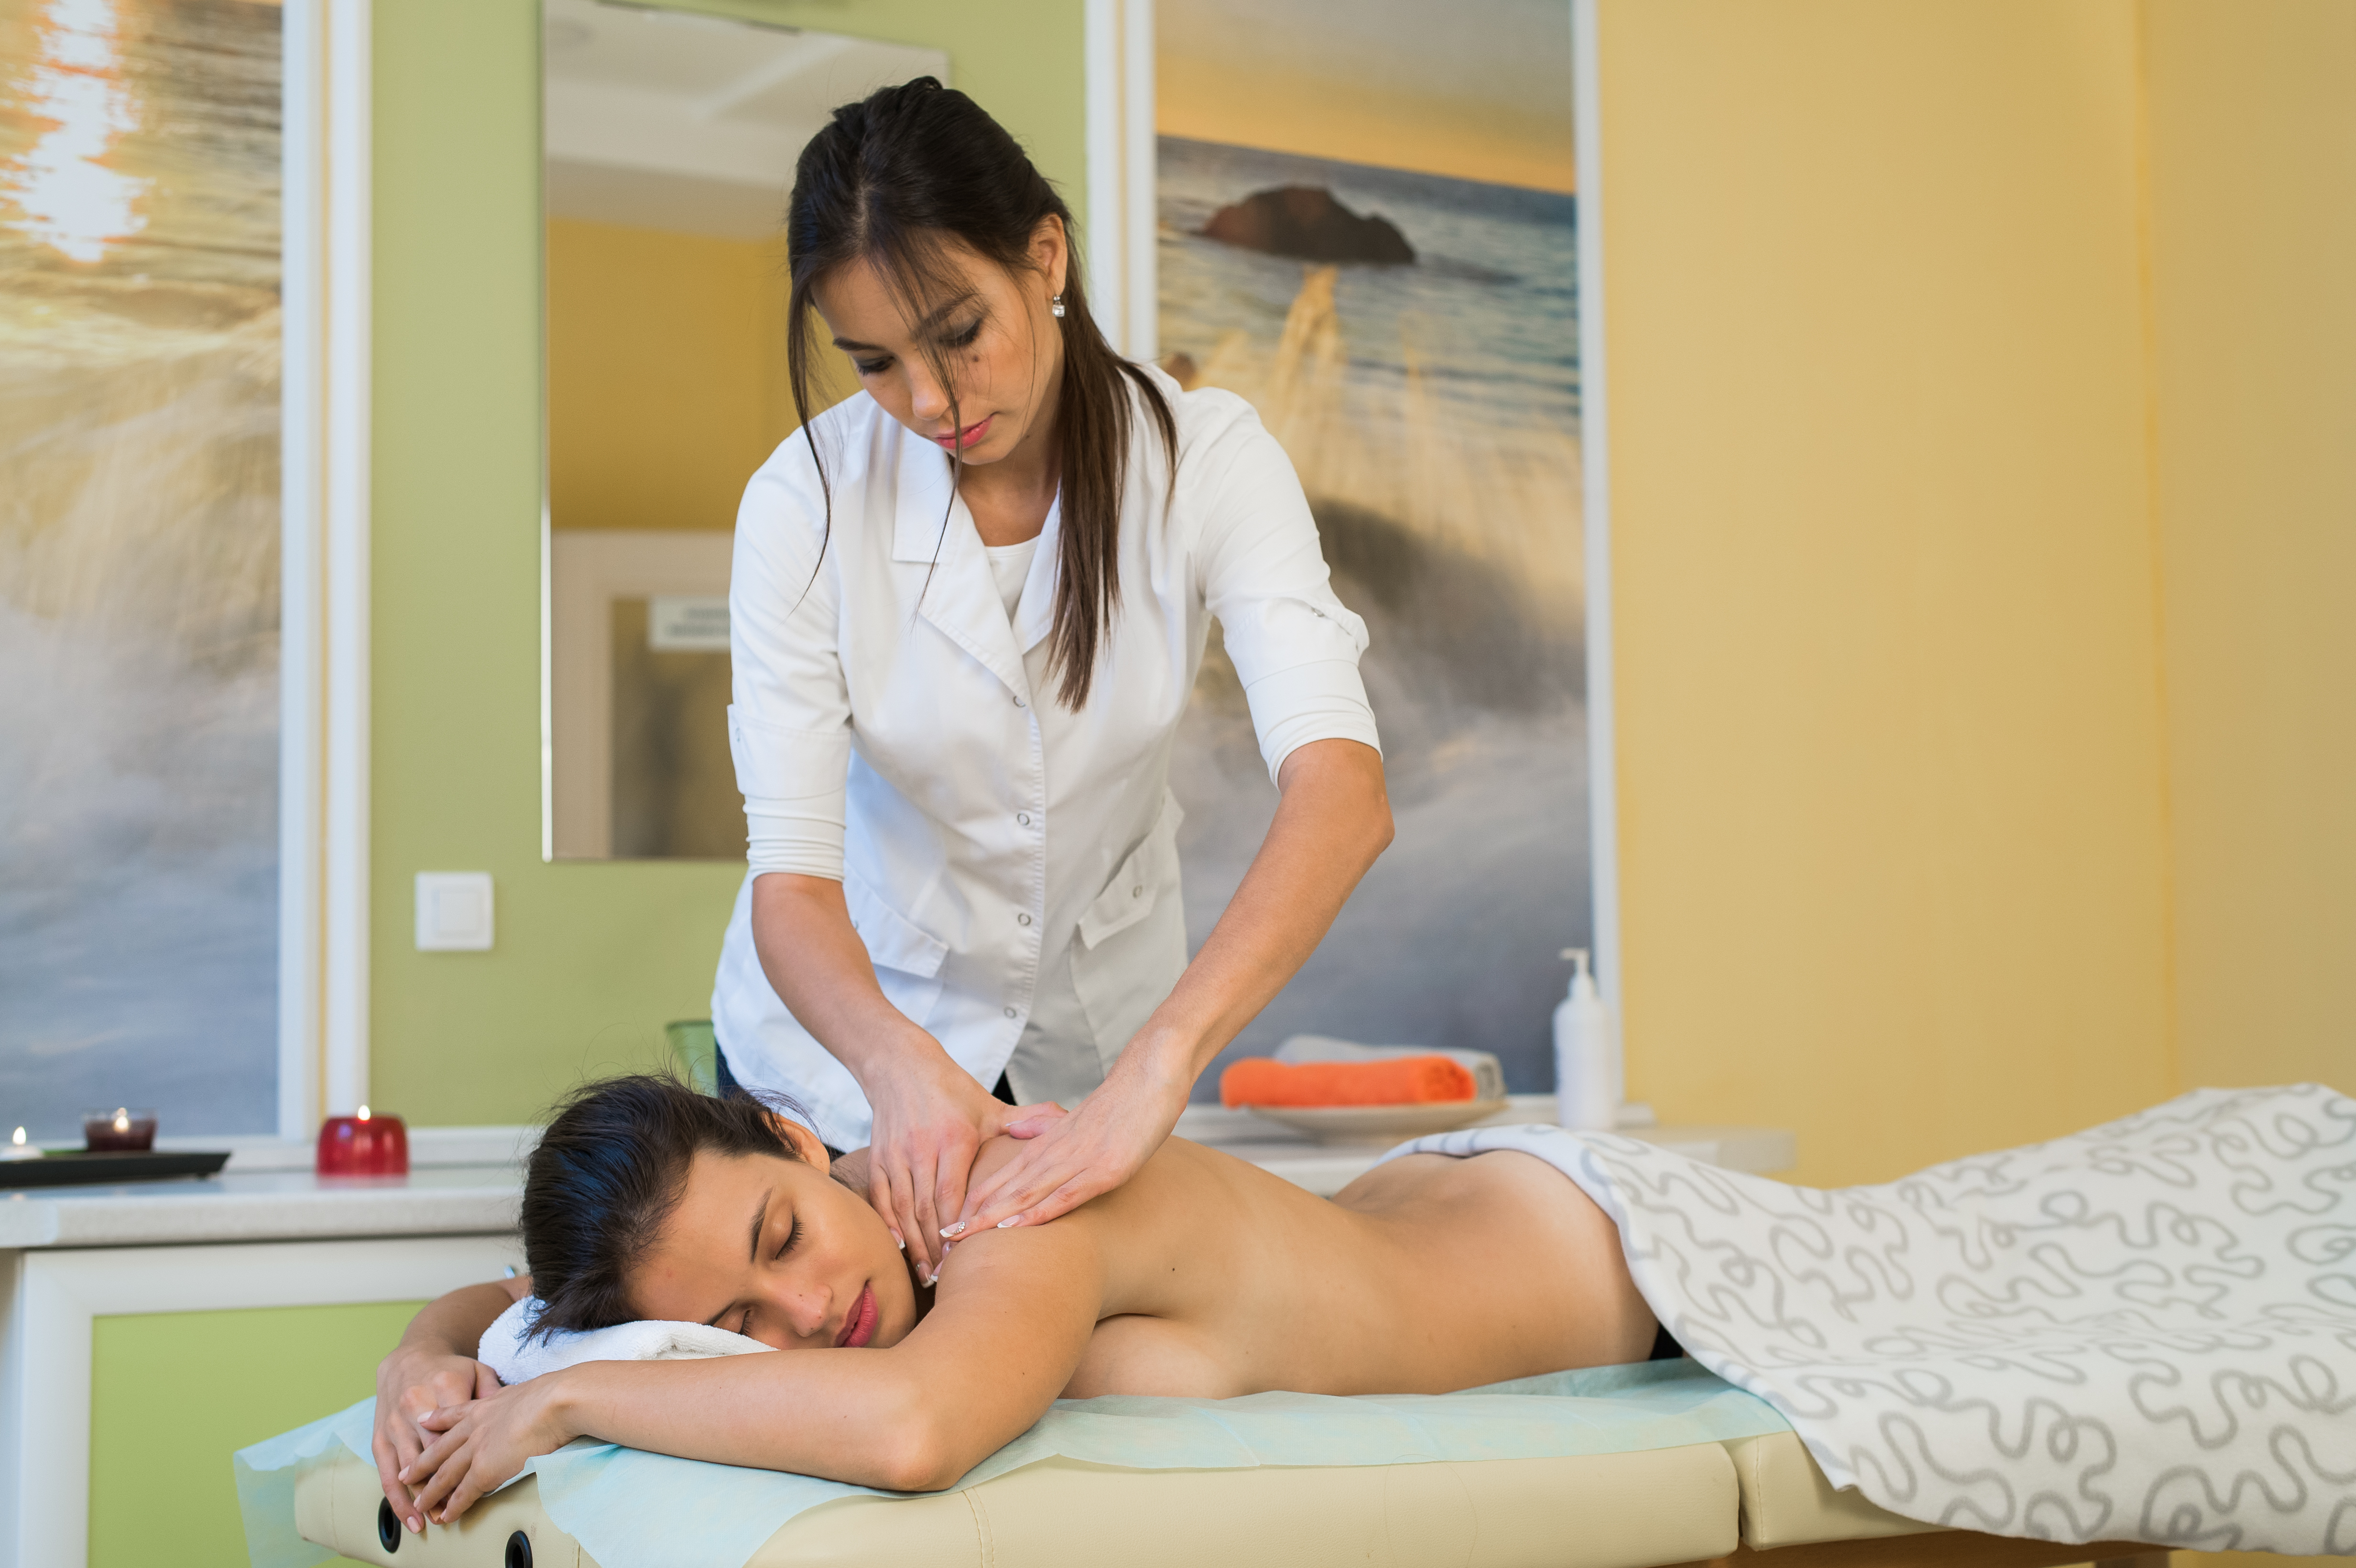 young woman enjoying back massage in beauty spa salon